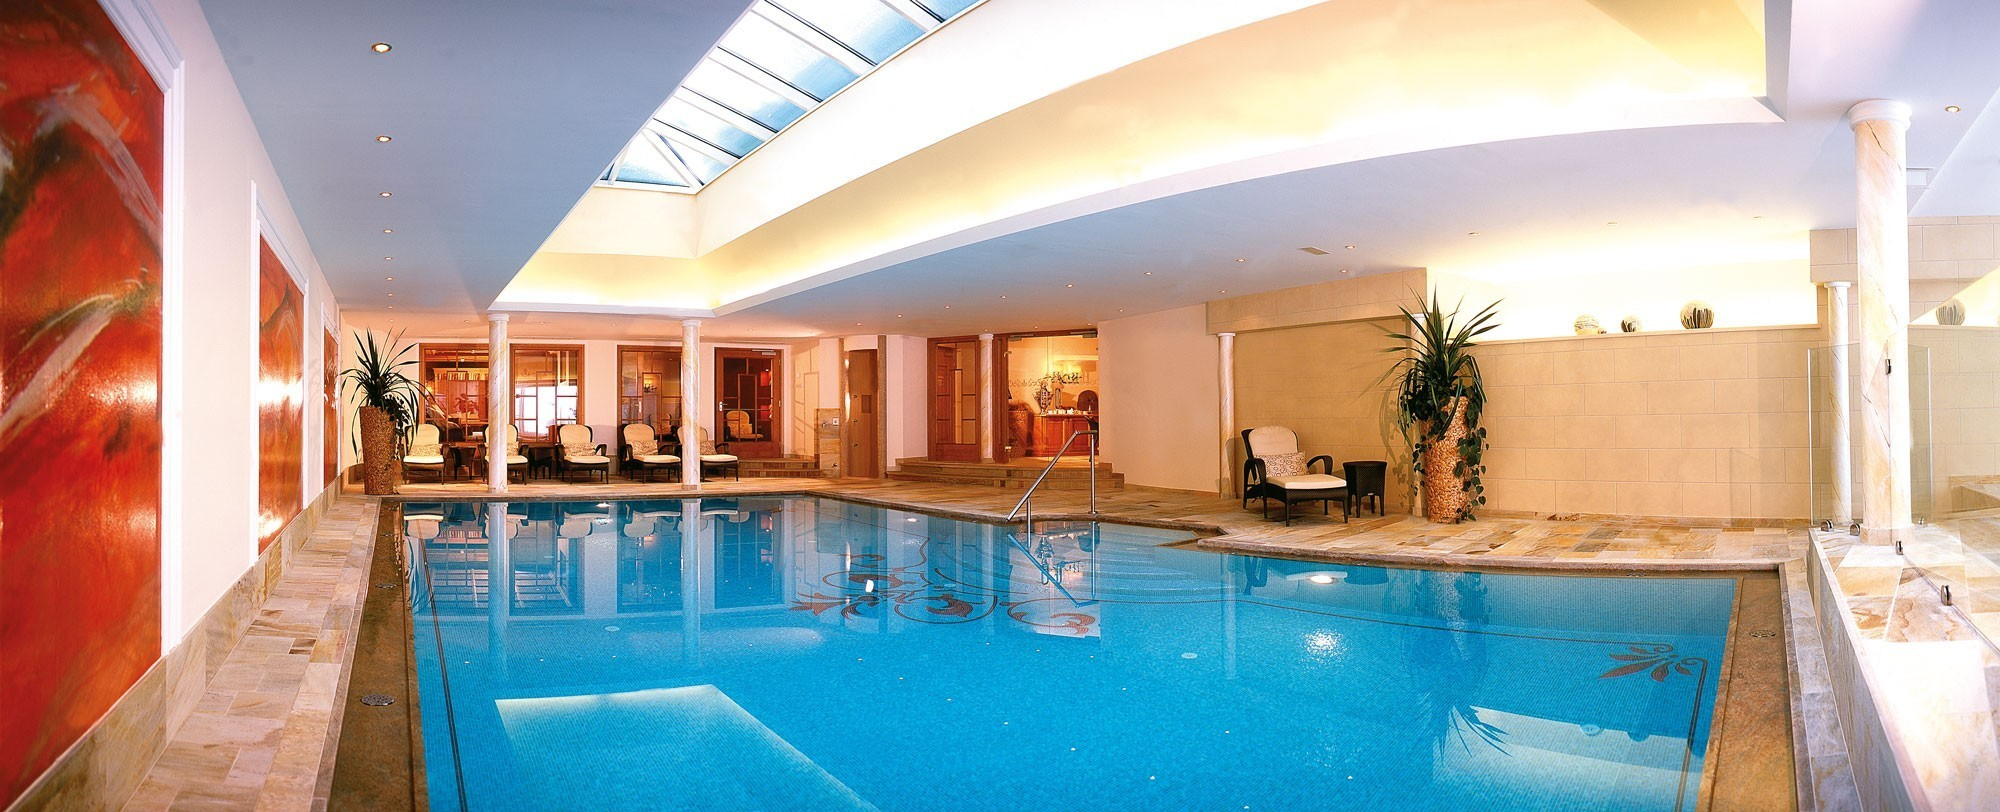 Lilienbad mit Indoor Pool im madlochblick.